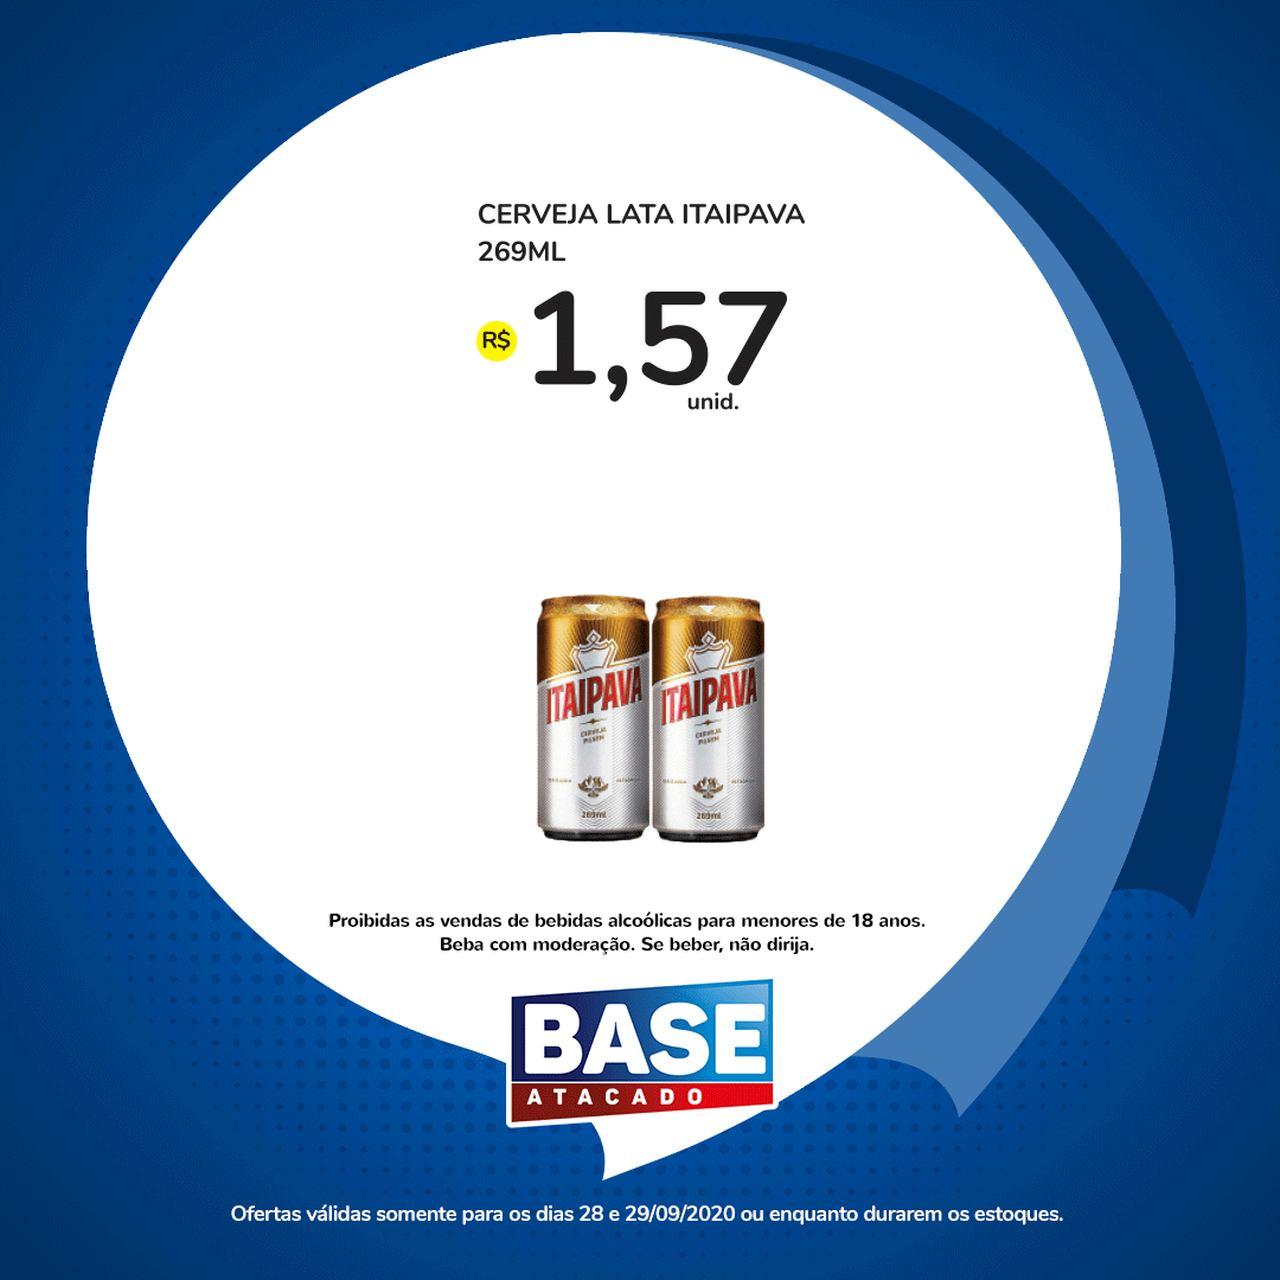 Ofertas de supermercado BASE atacado segunda e terça de super ofertas vence 29-09-10